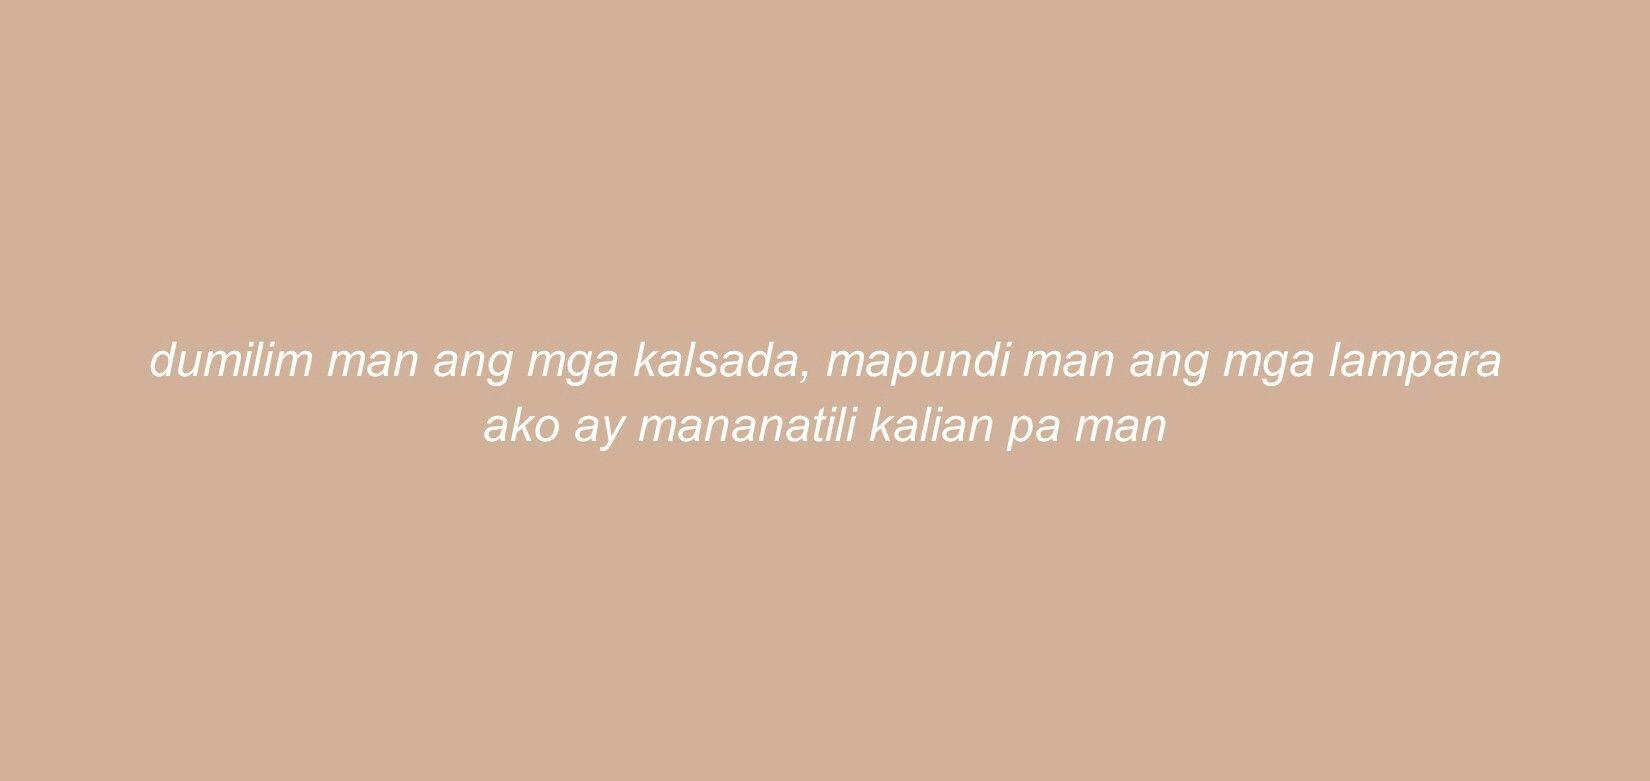 Banaag Munimuni Twitter Header Lyrics Twitter Header Quotes Tagalog Quotes